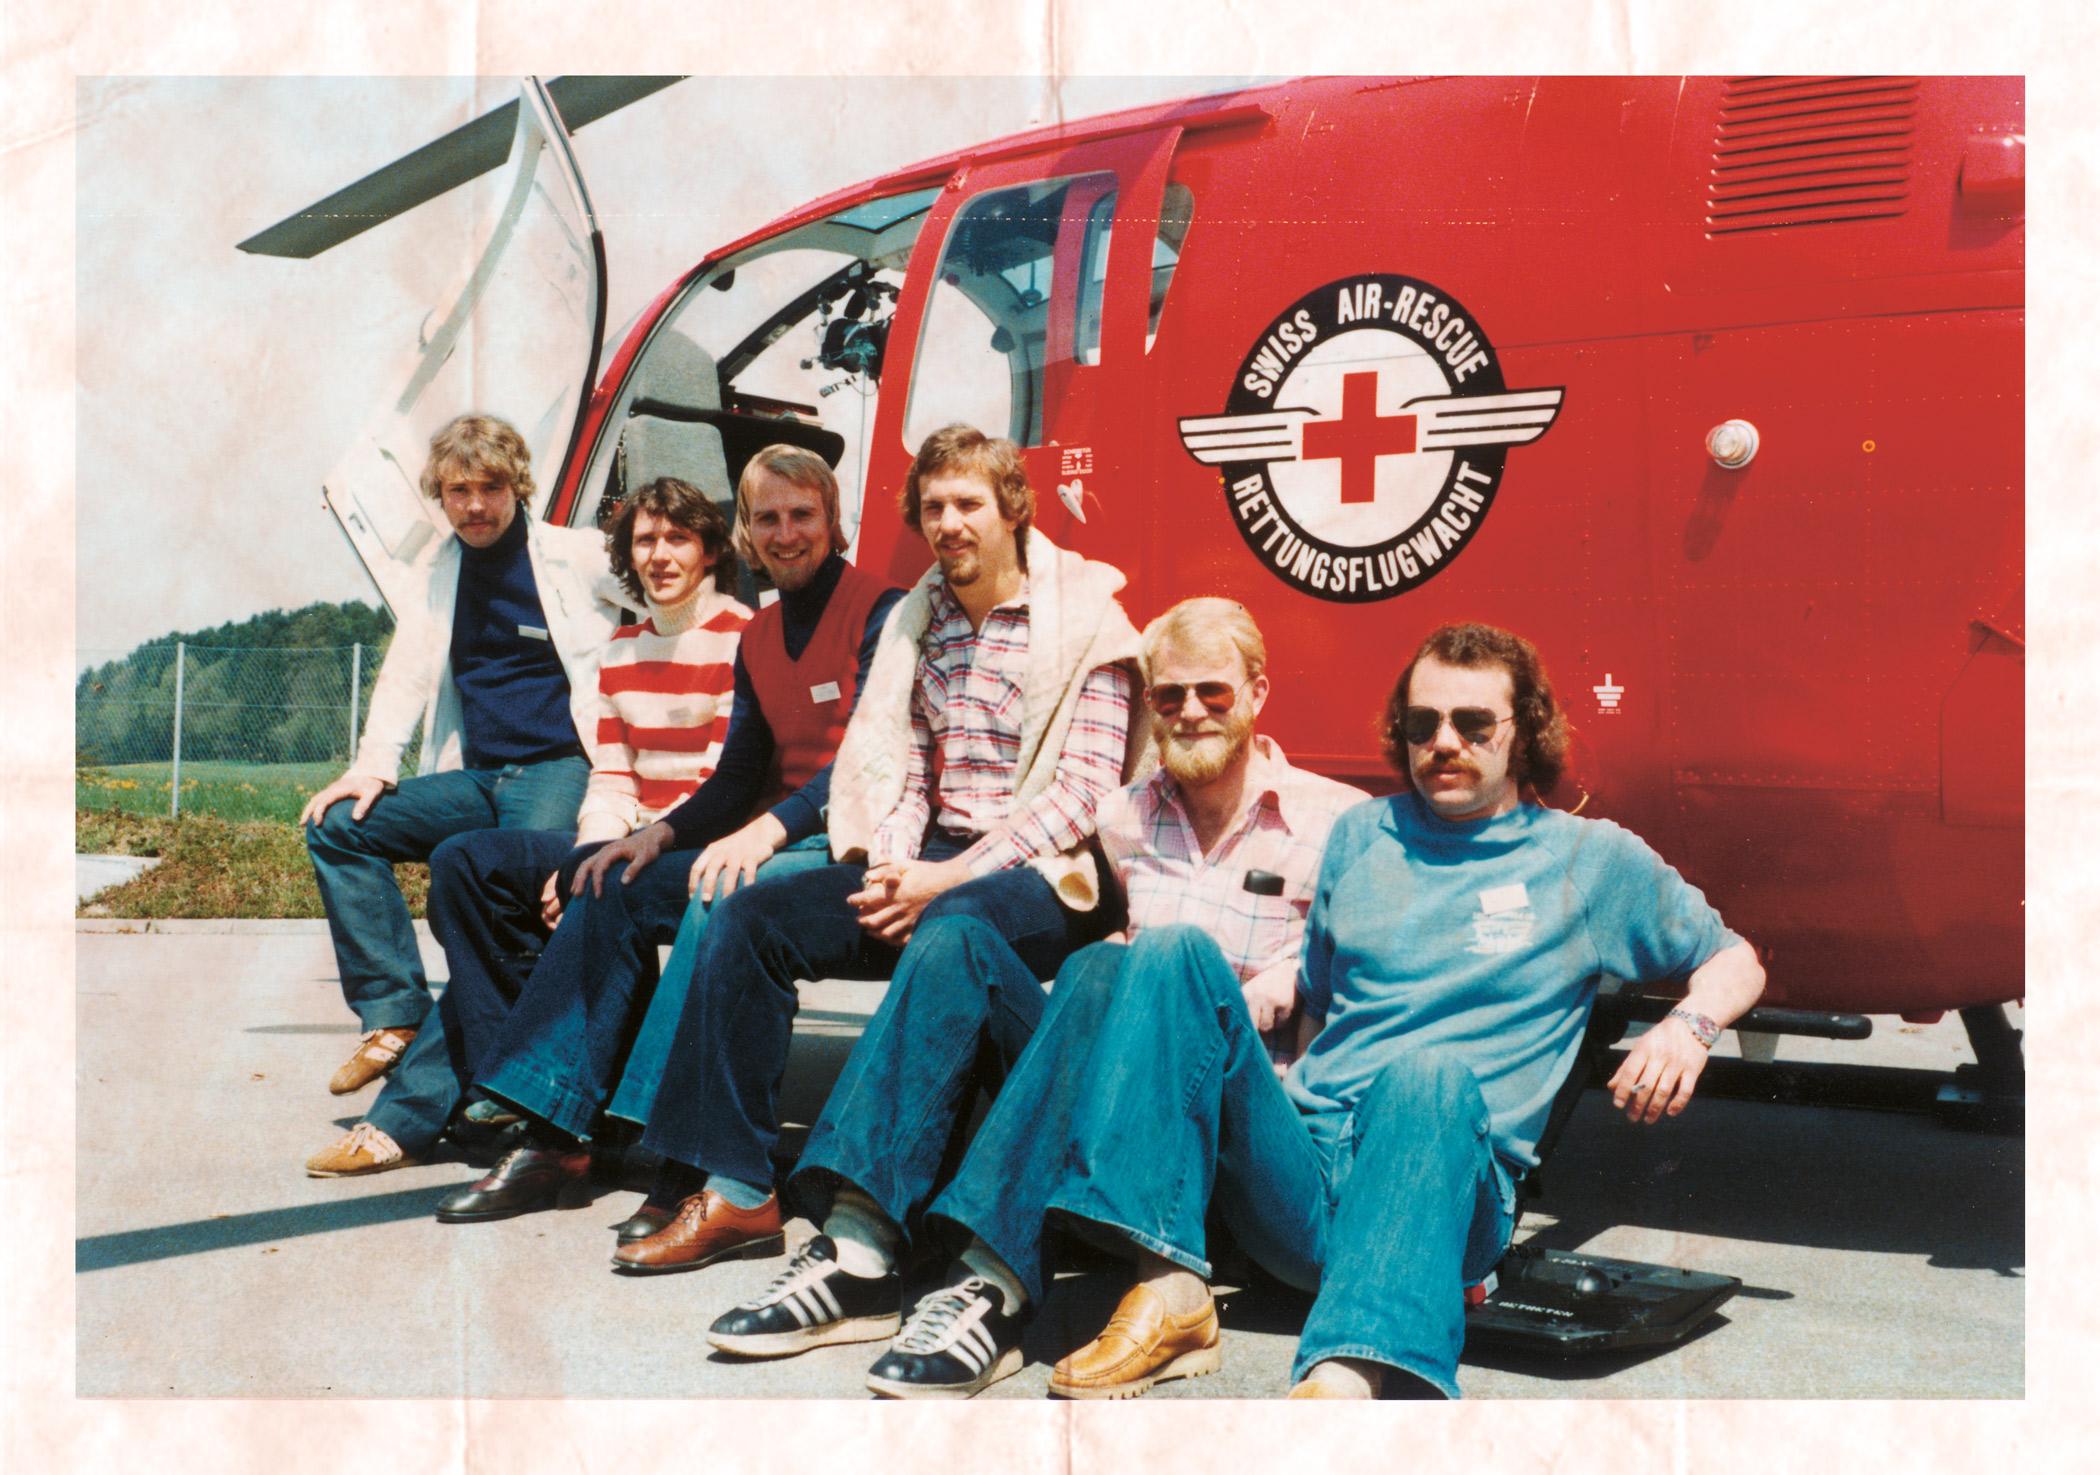 Seks nordmenn sitter foran sveitsisk helikopter.